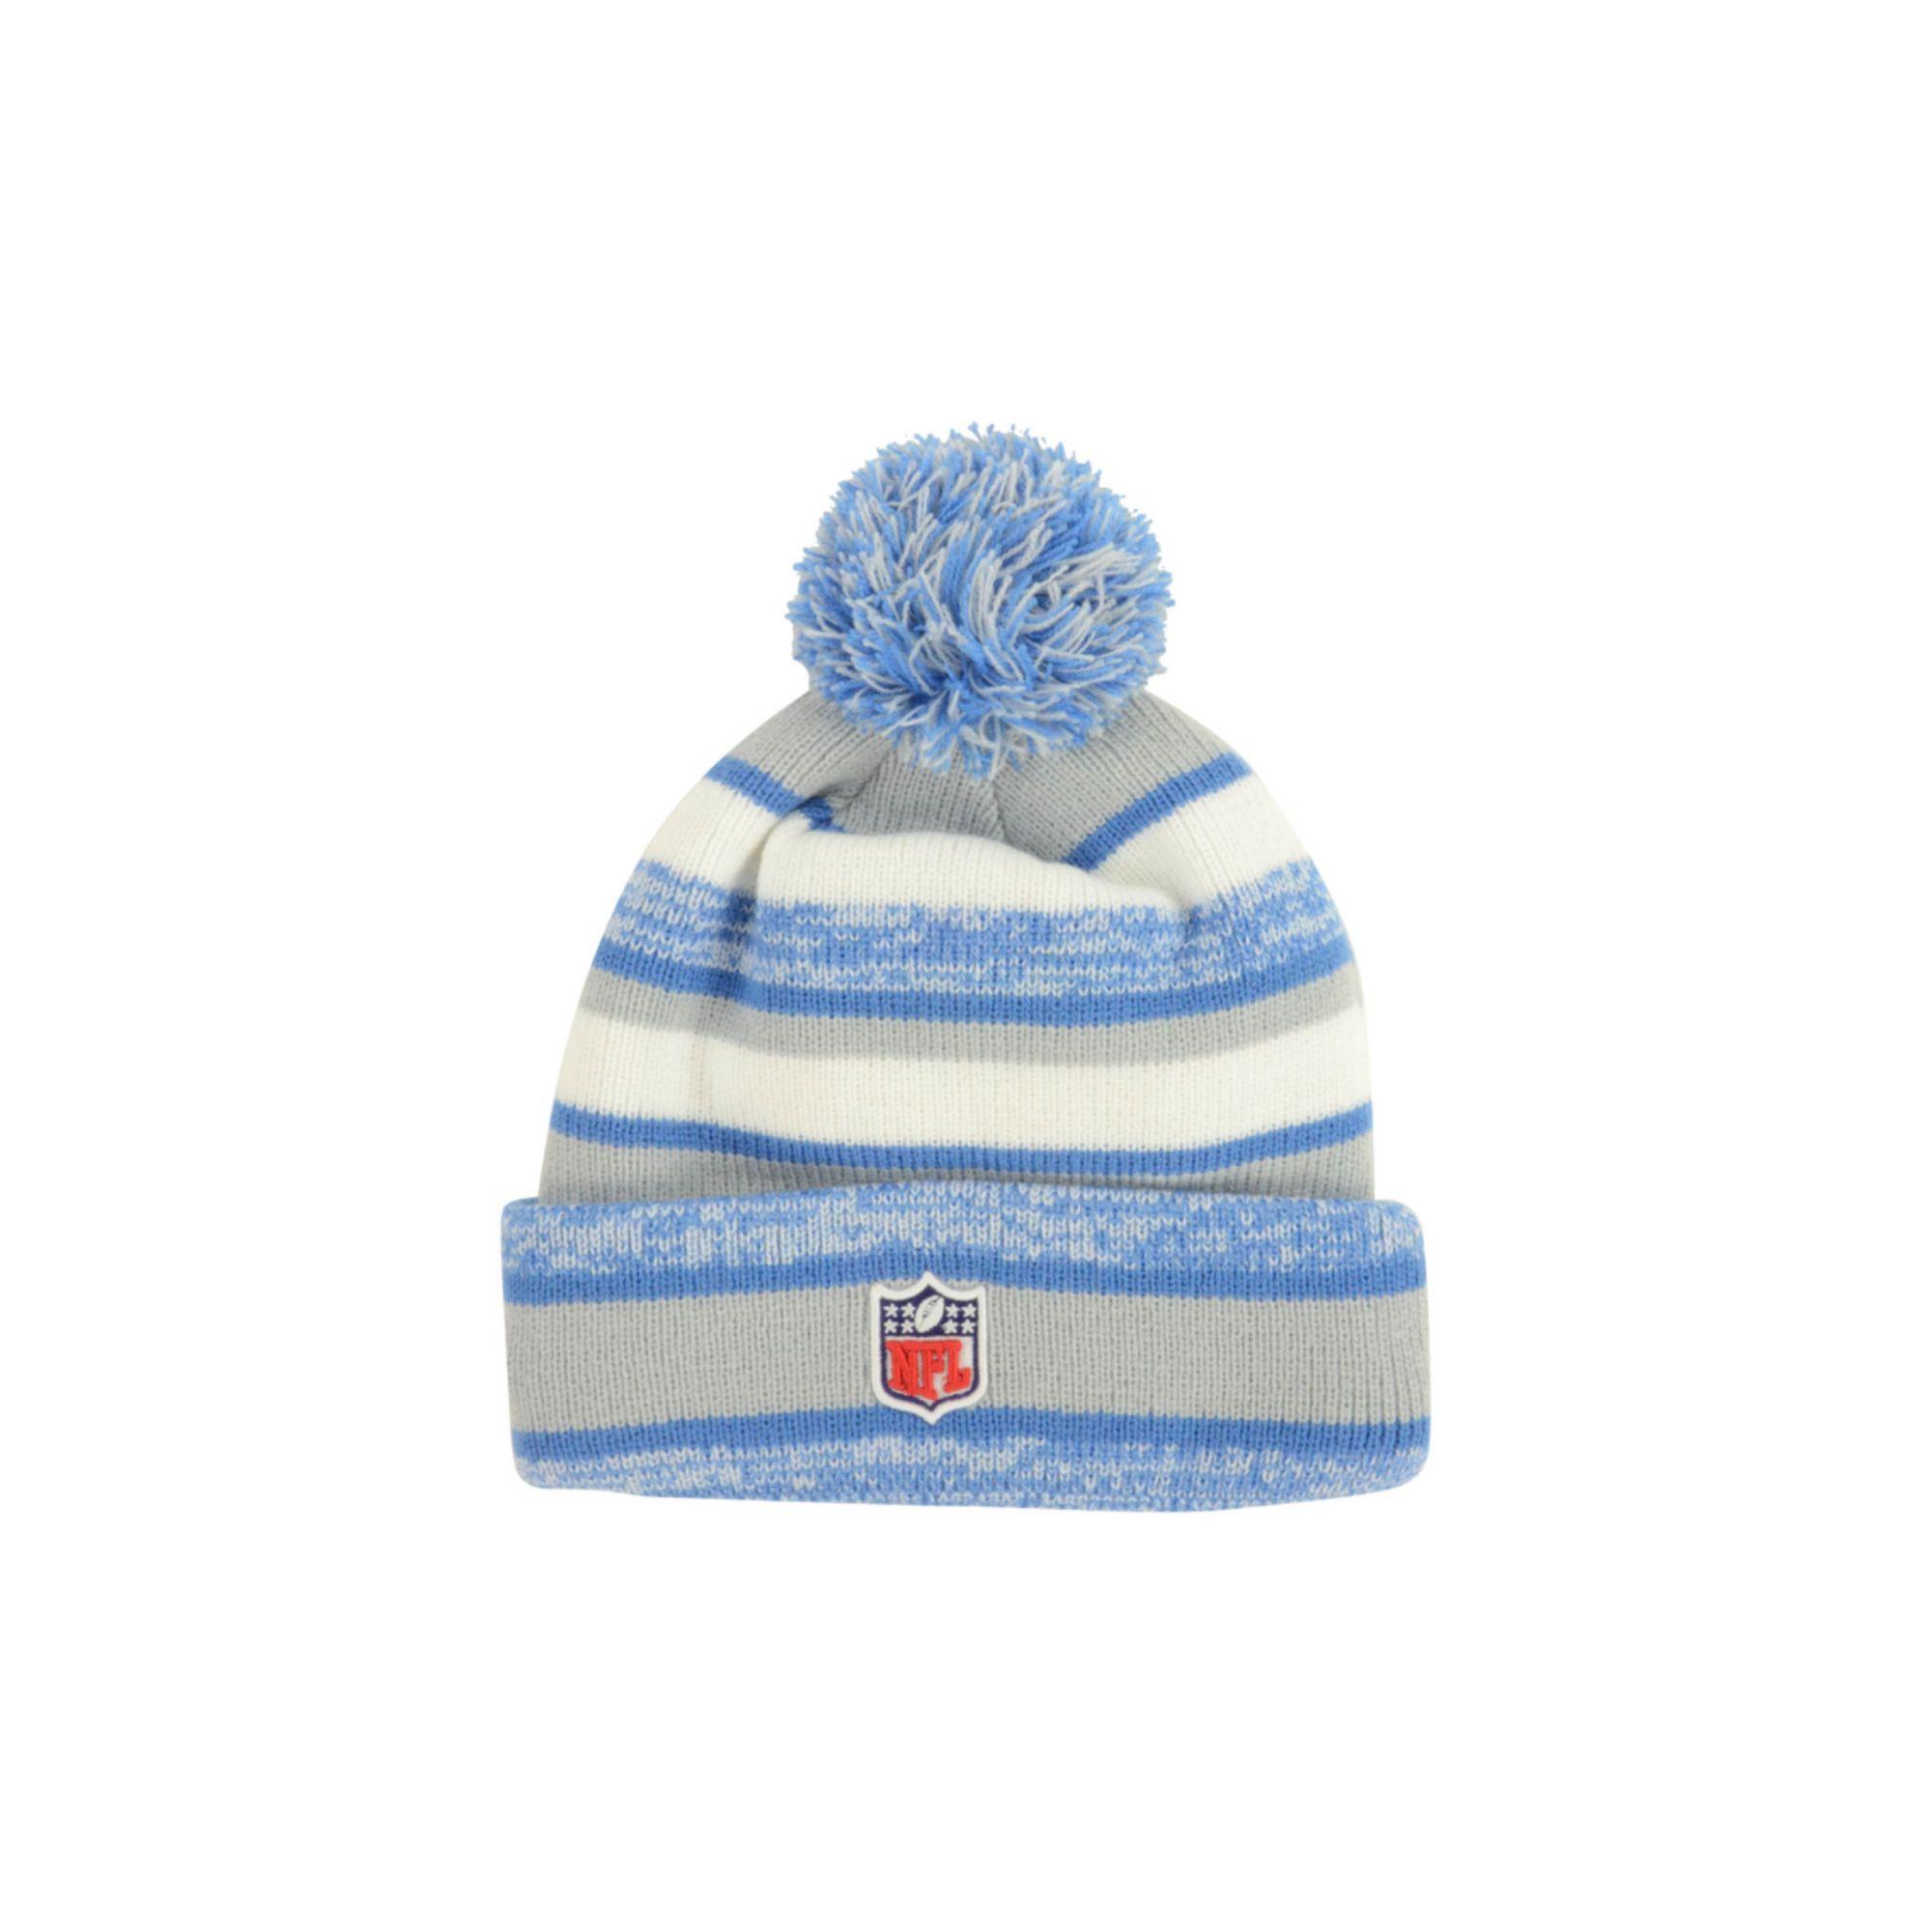 newest 94bab 78df6 Lyst - KTZ Detroit Lions Sport Knit Hat in Blue for Men